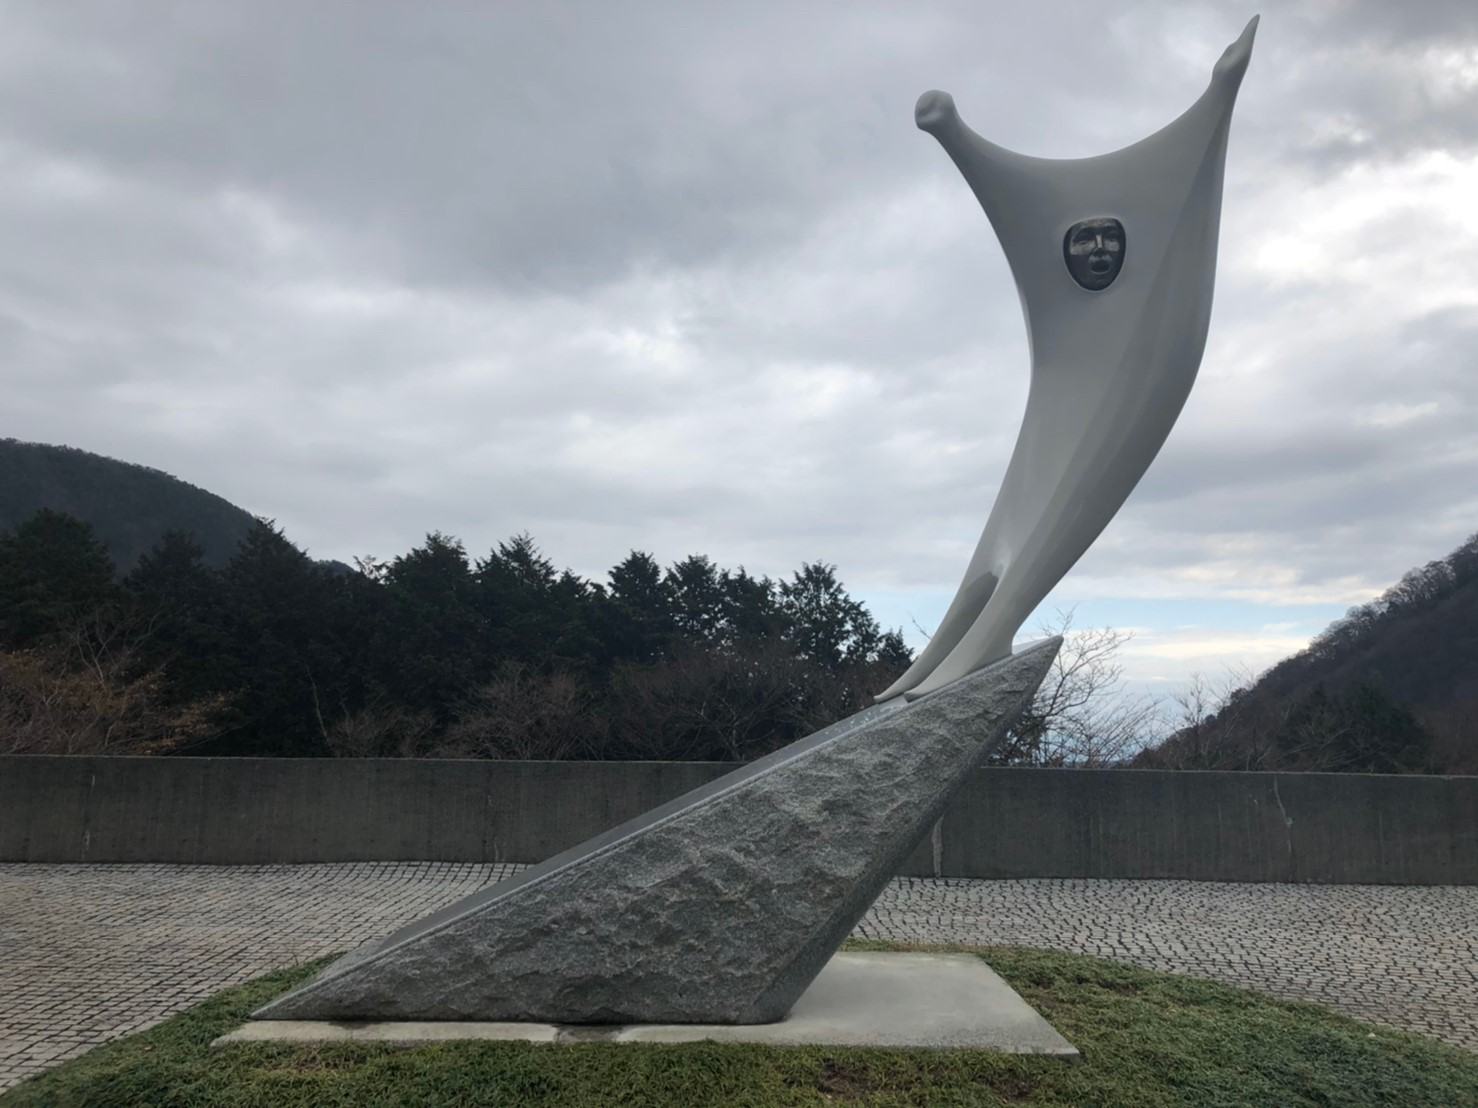 箱根旅行記 彫刻の森美術館